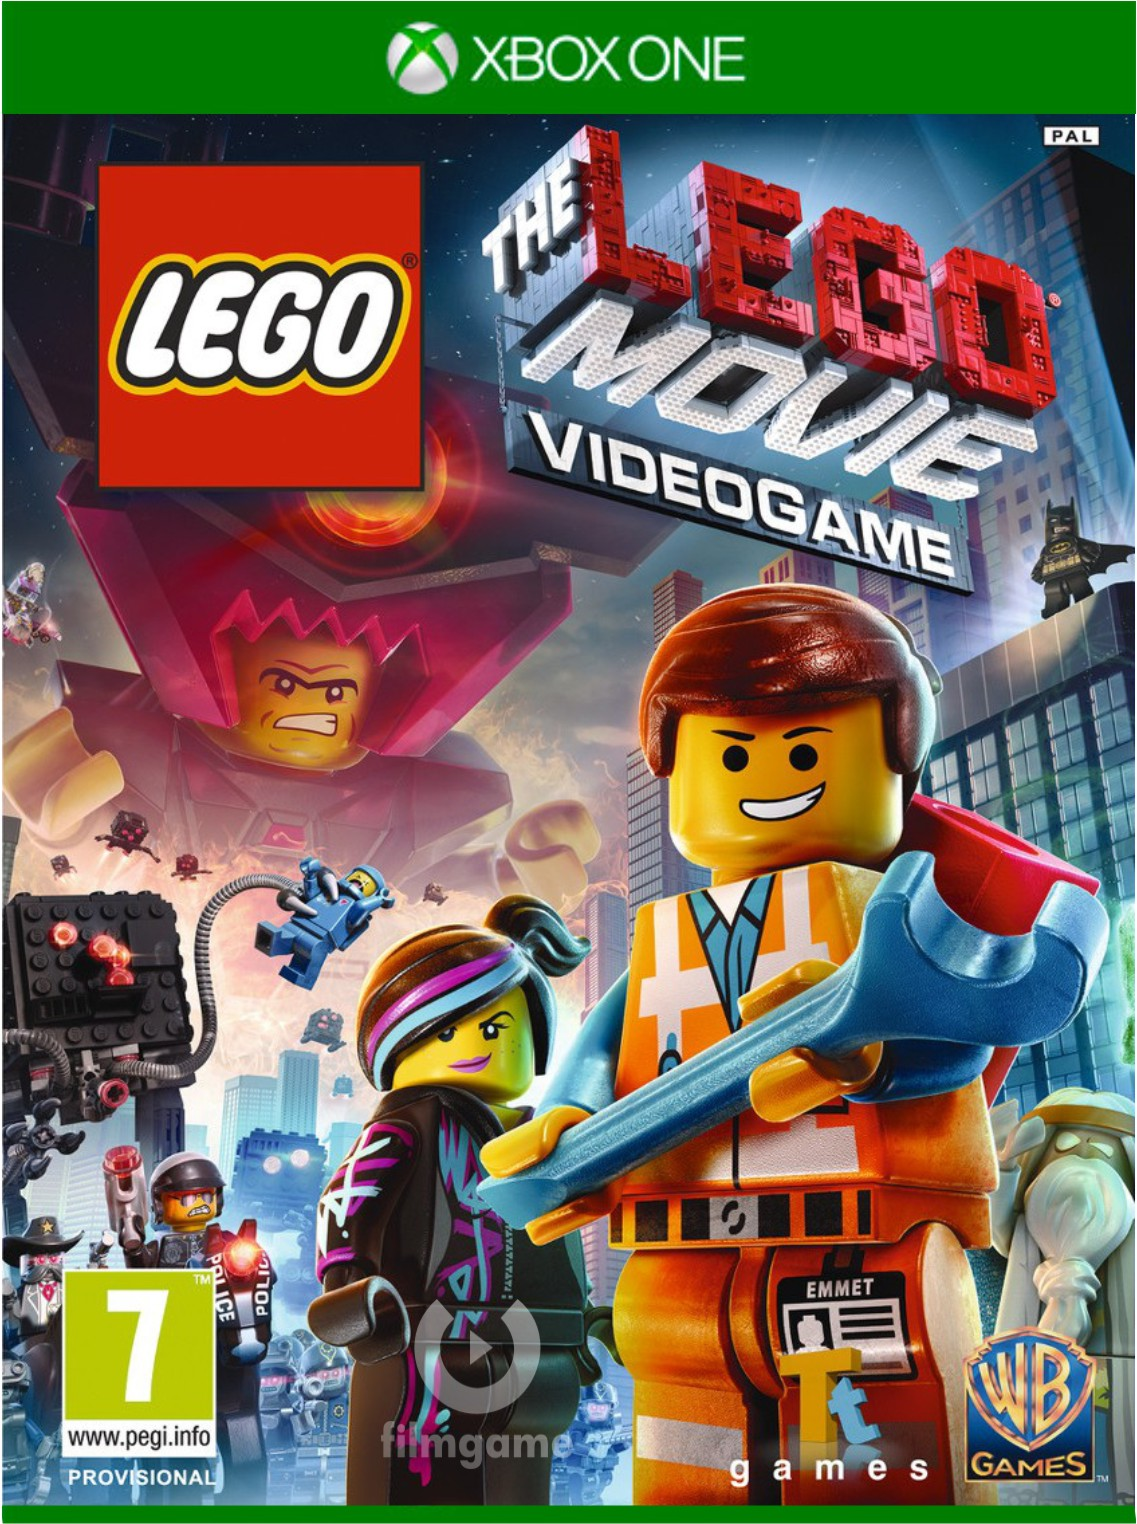 LEGO MOVIE: THE VIDEOGAME - Xone